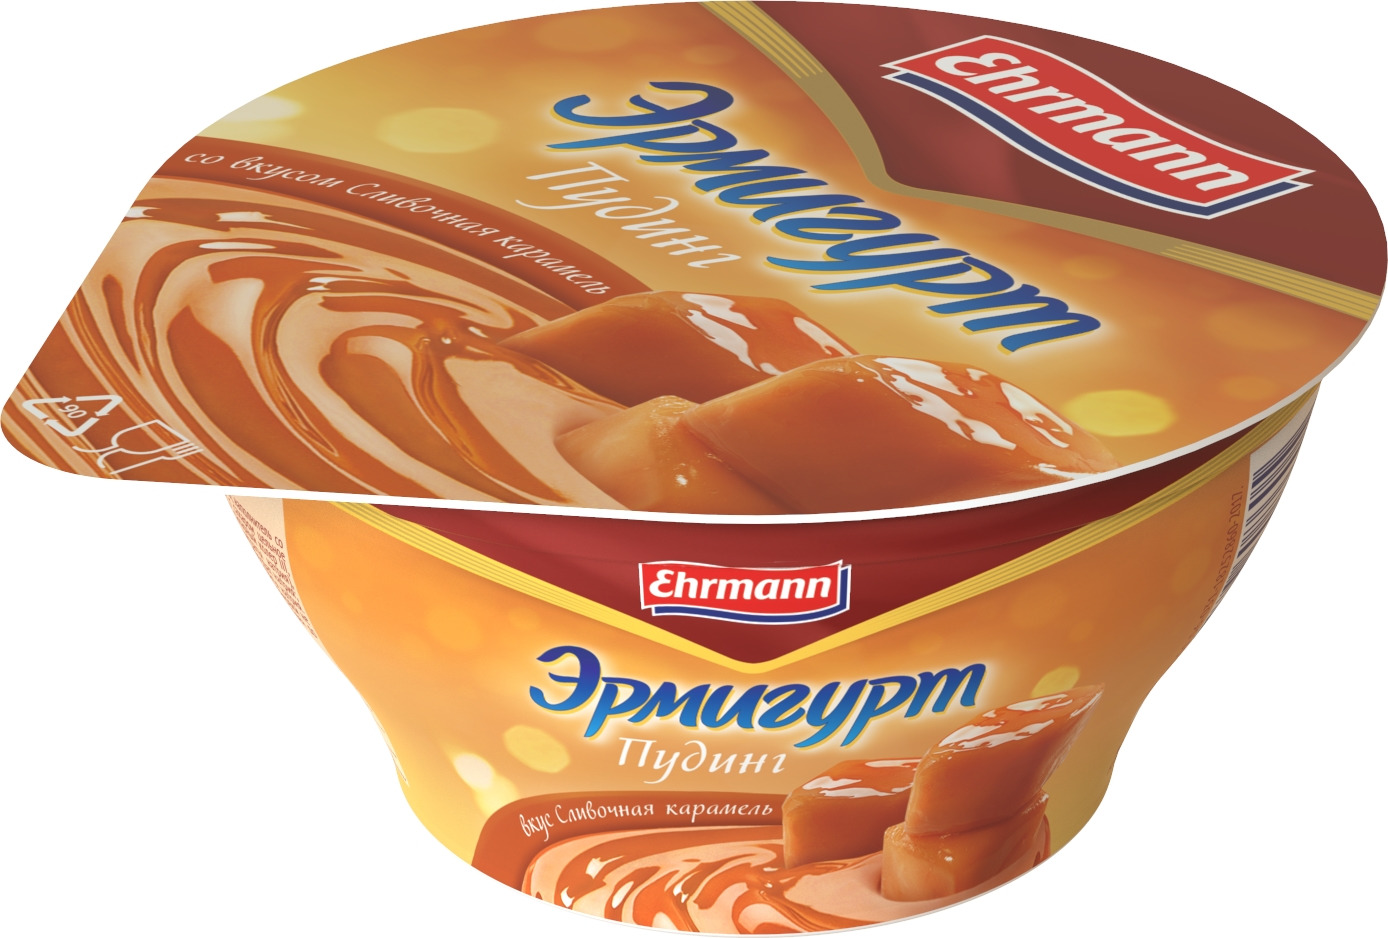 Пудинг Эрмигурт, со вкусом Сливочная карамель, 3,3%, 140 г Эрмигурт